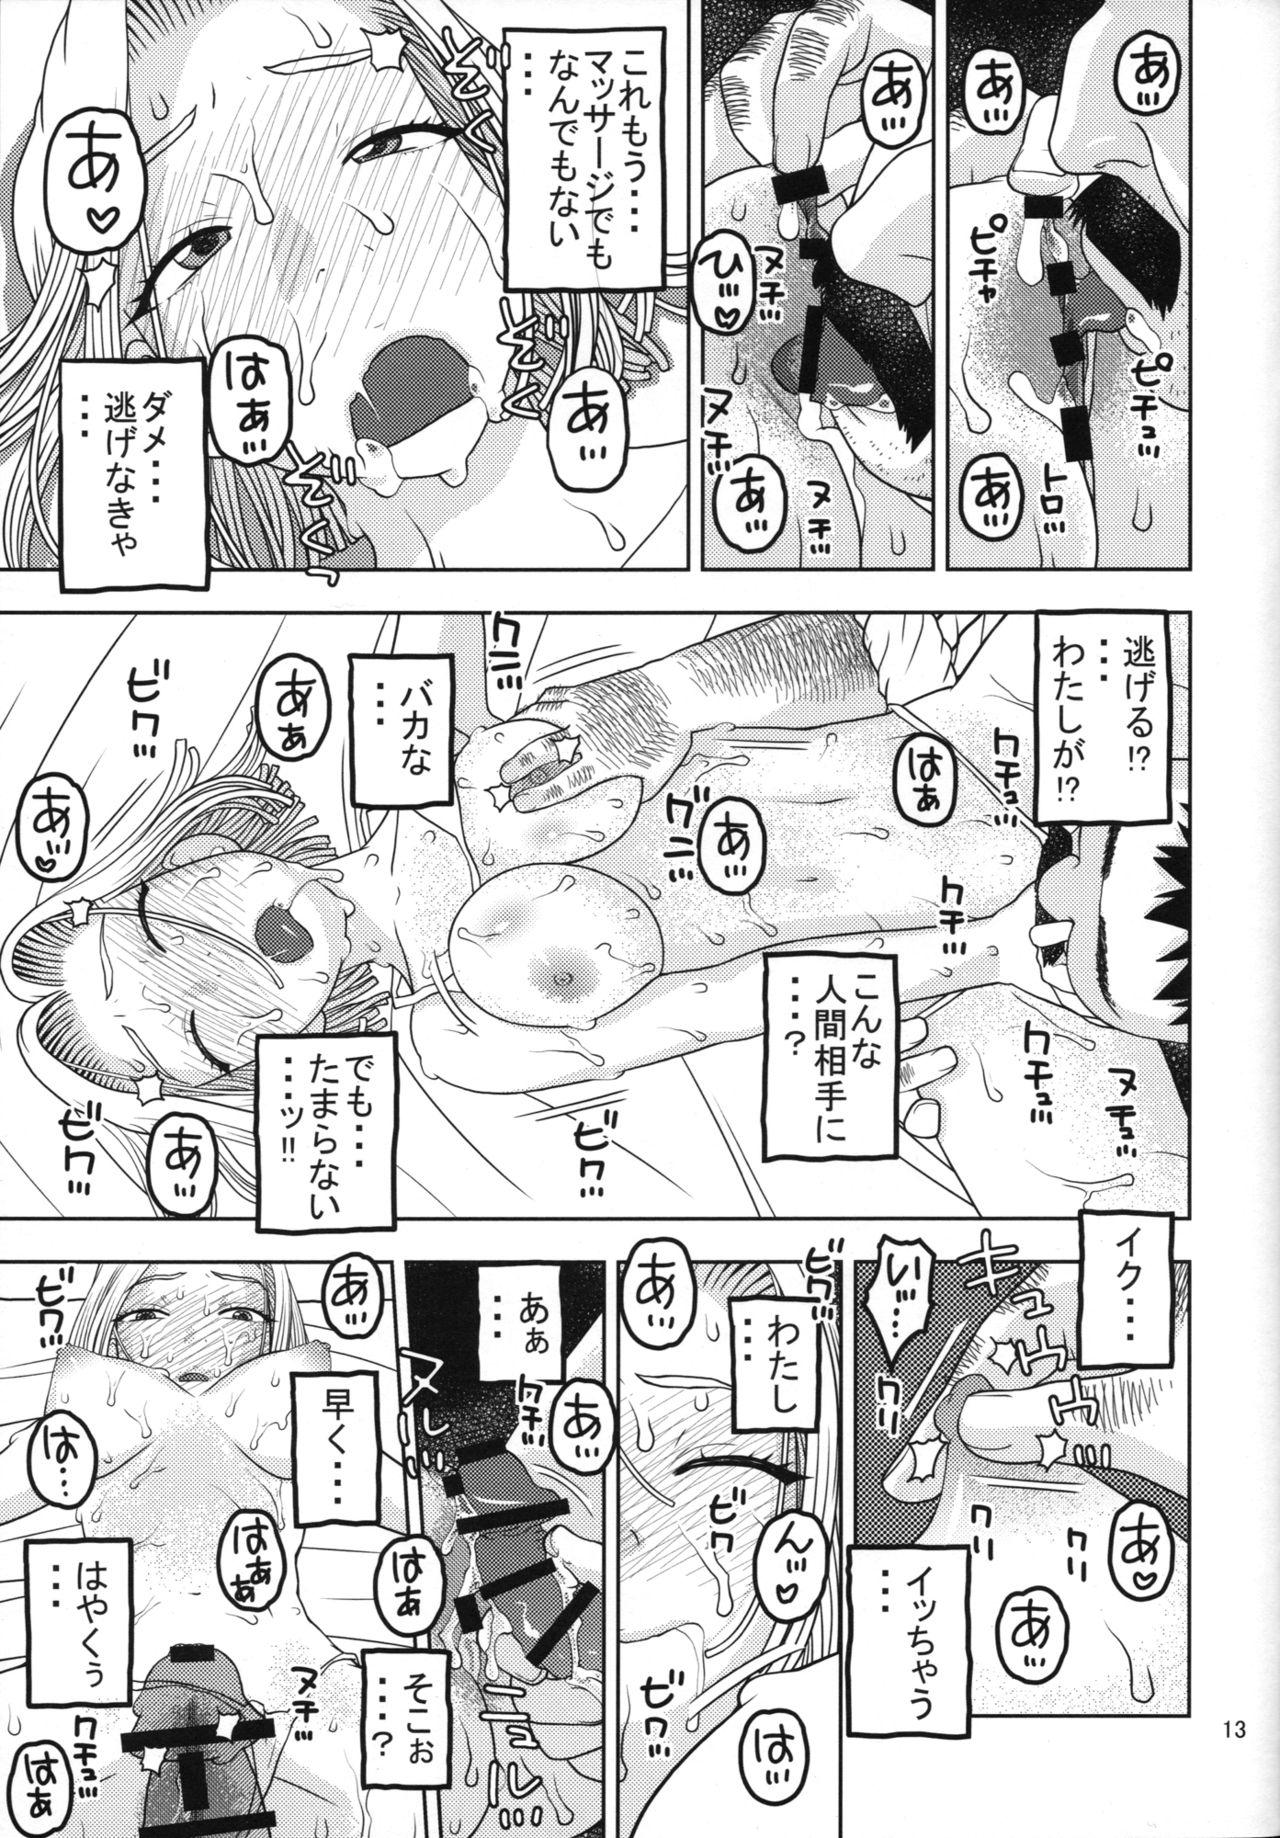 18-gou to Oil Massage de Seikou 11